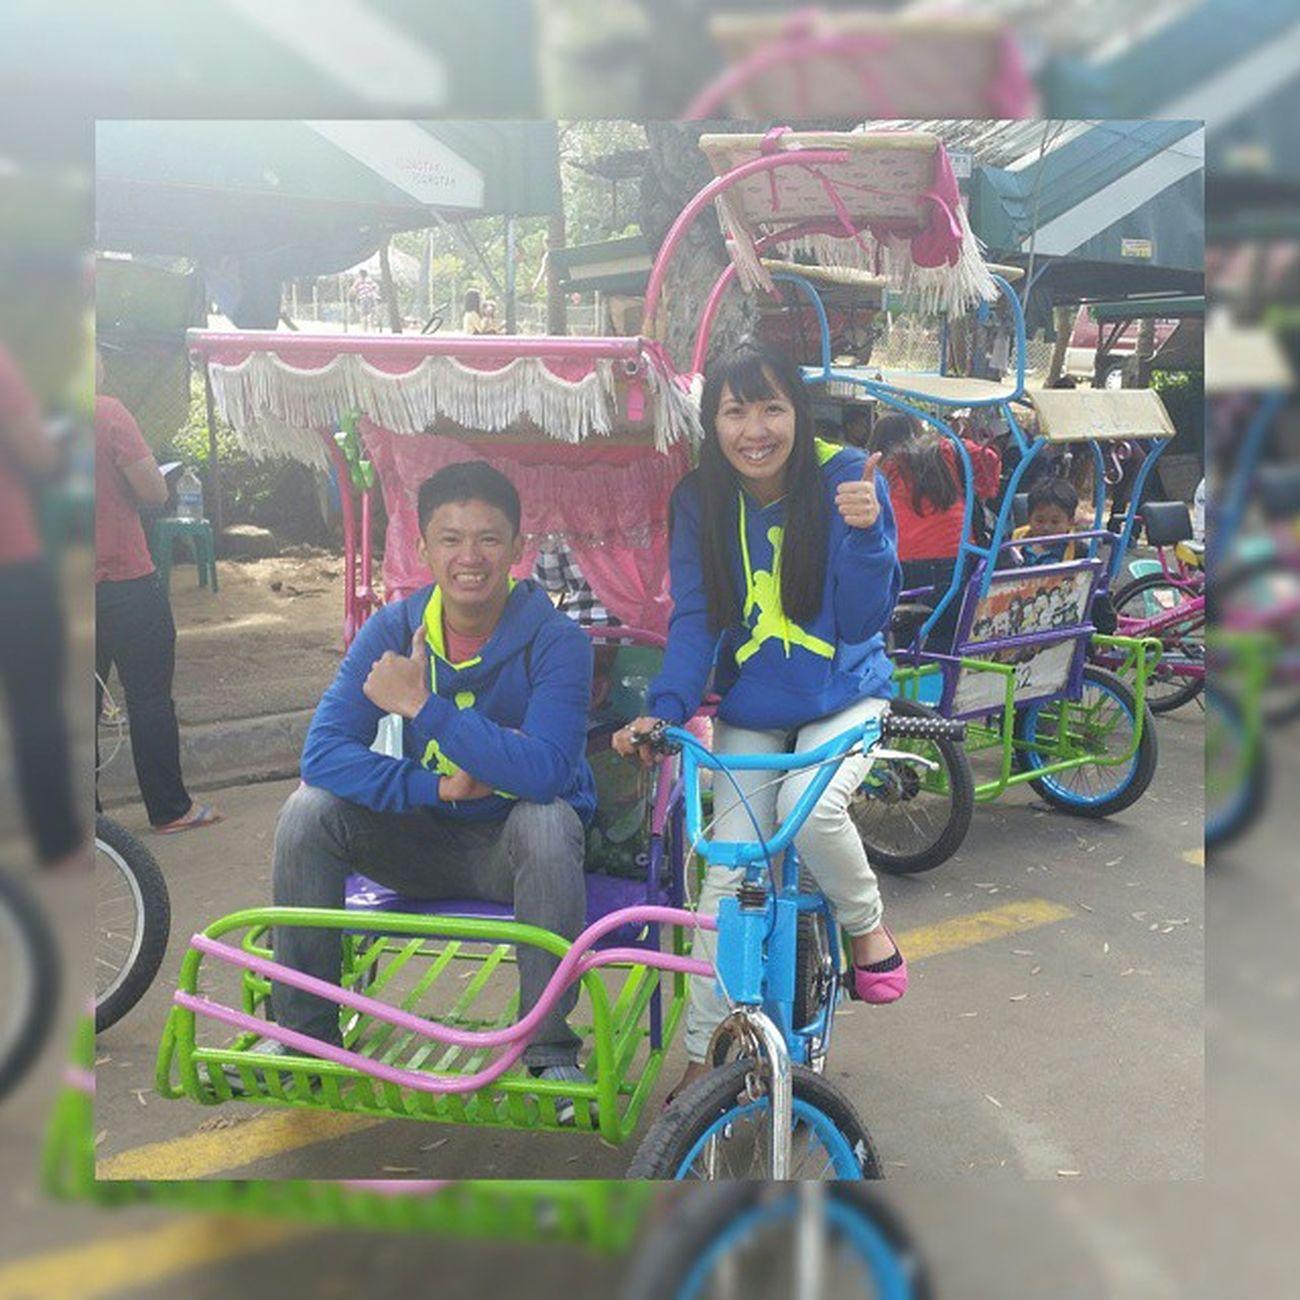 Ipinagdrive ko sya mula Manila to Baguio! 😥 Bestdateever Bestdayofmylife  Baguio2015